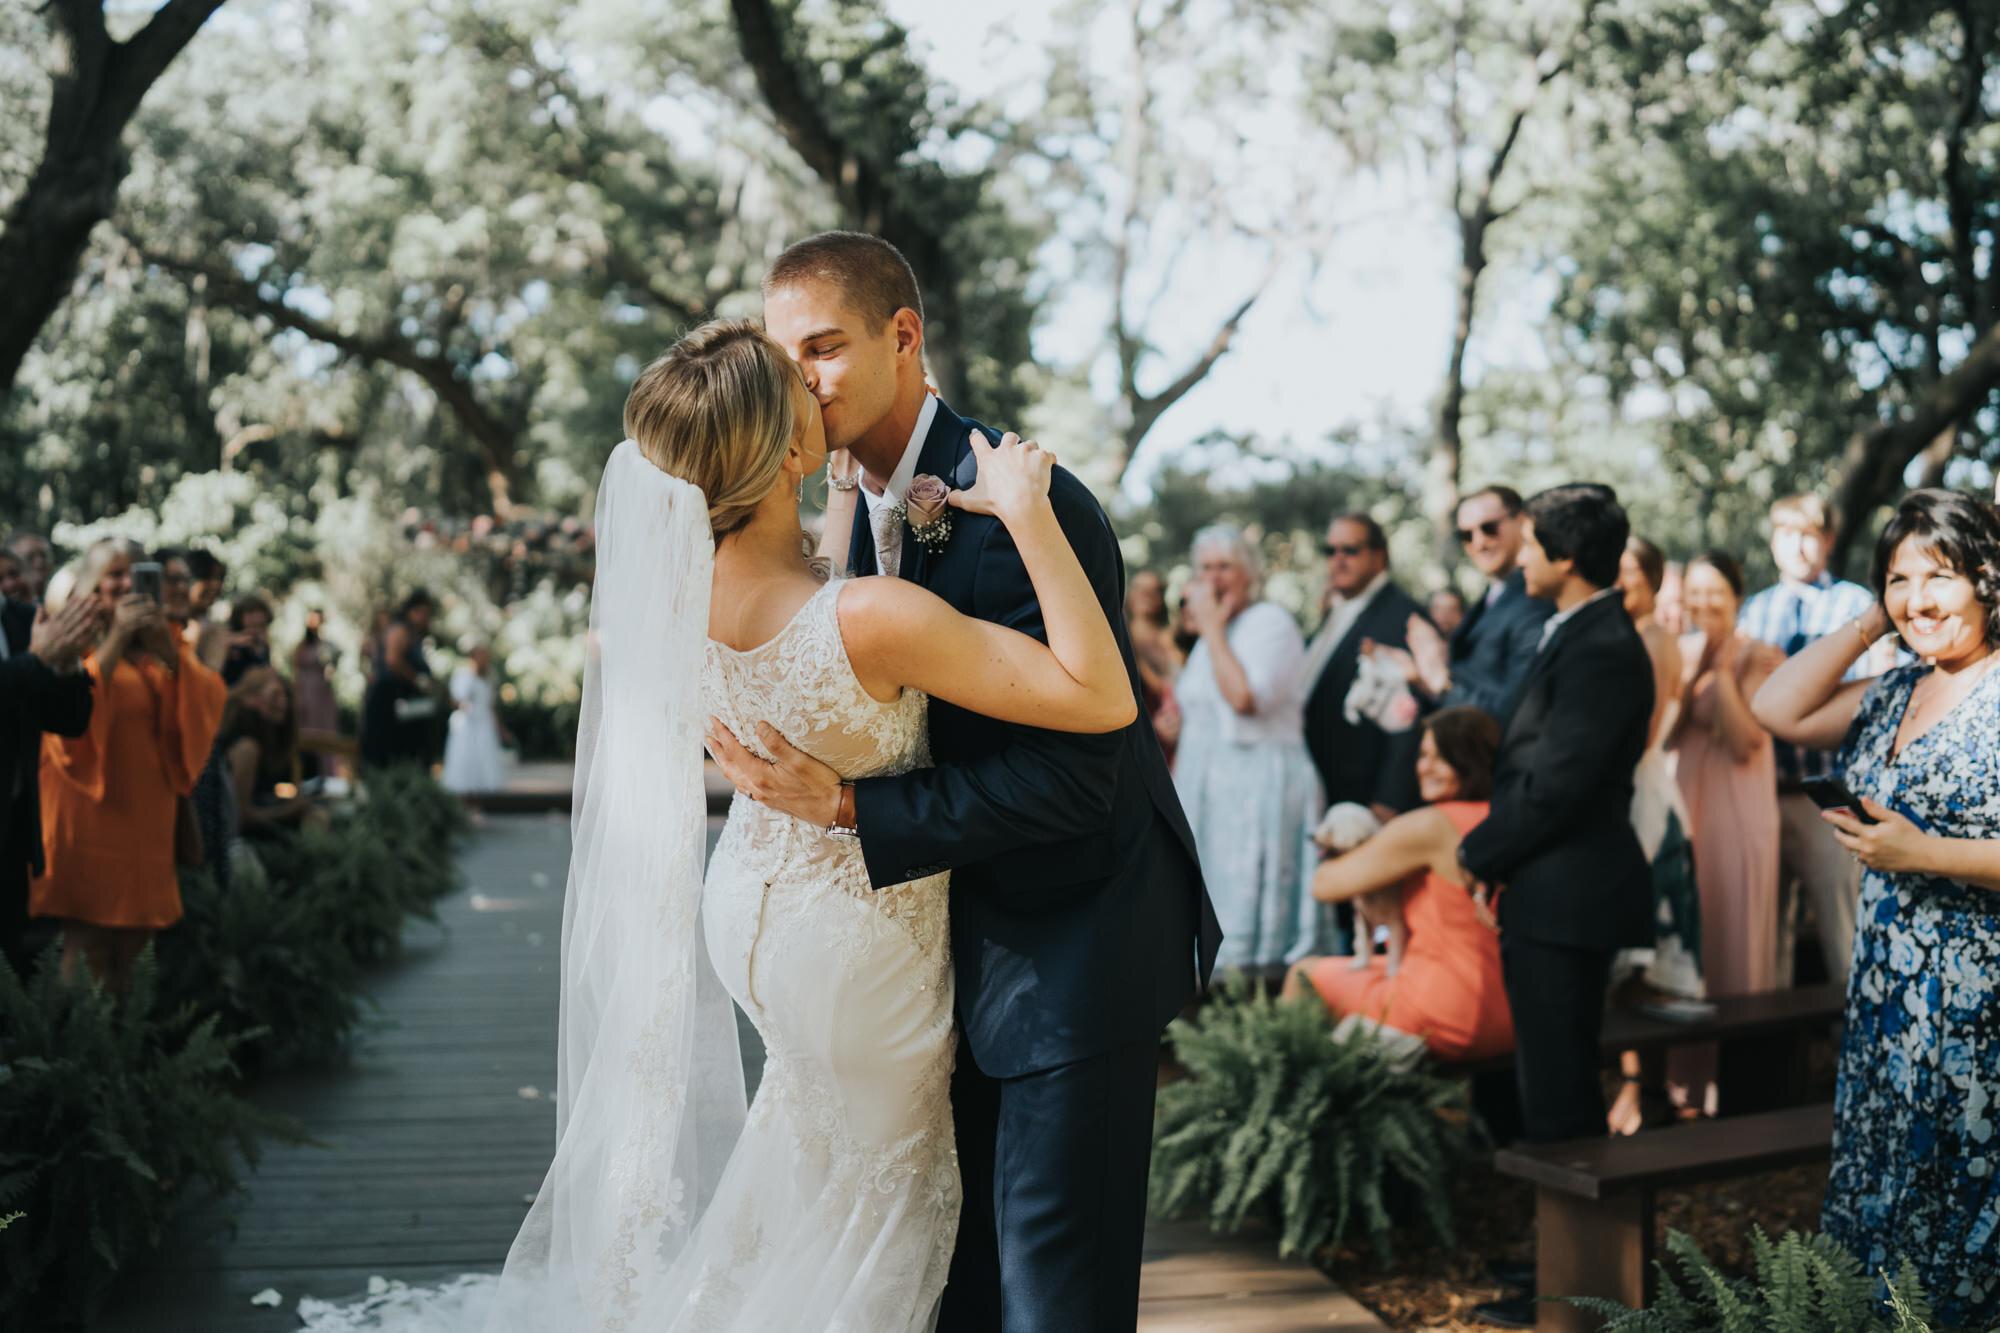 262Sean_Emily_Wedding_3-30-19.jpg